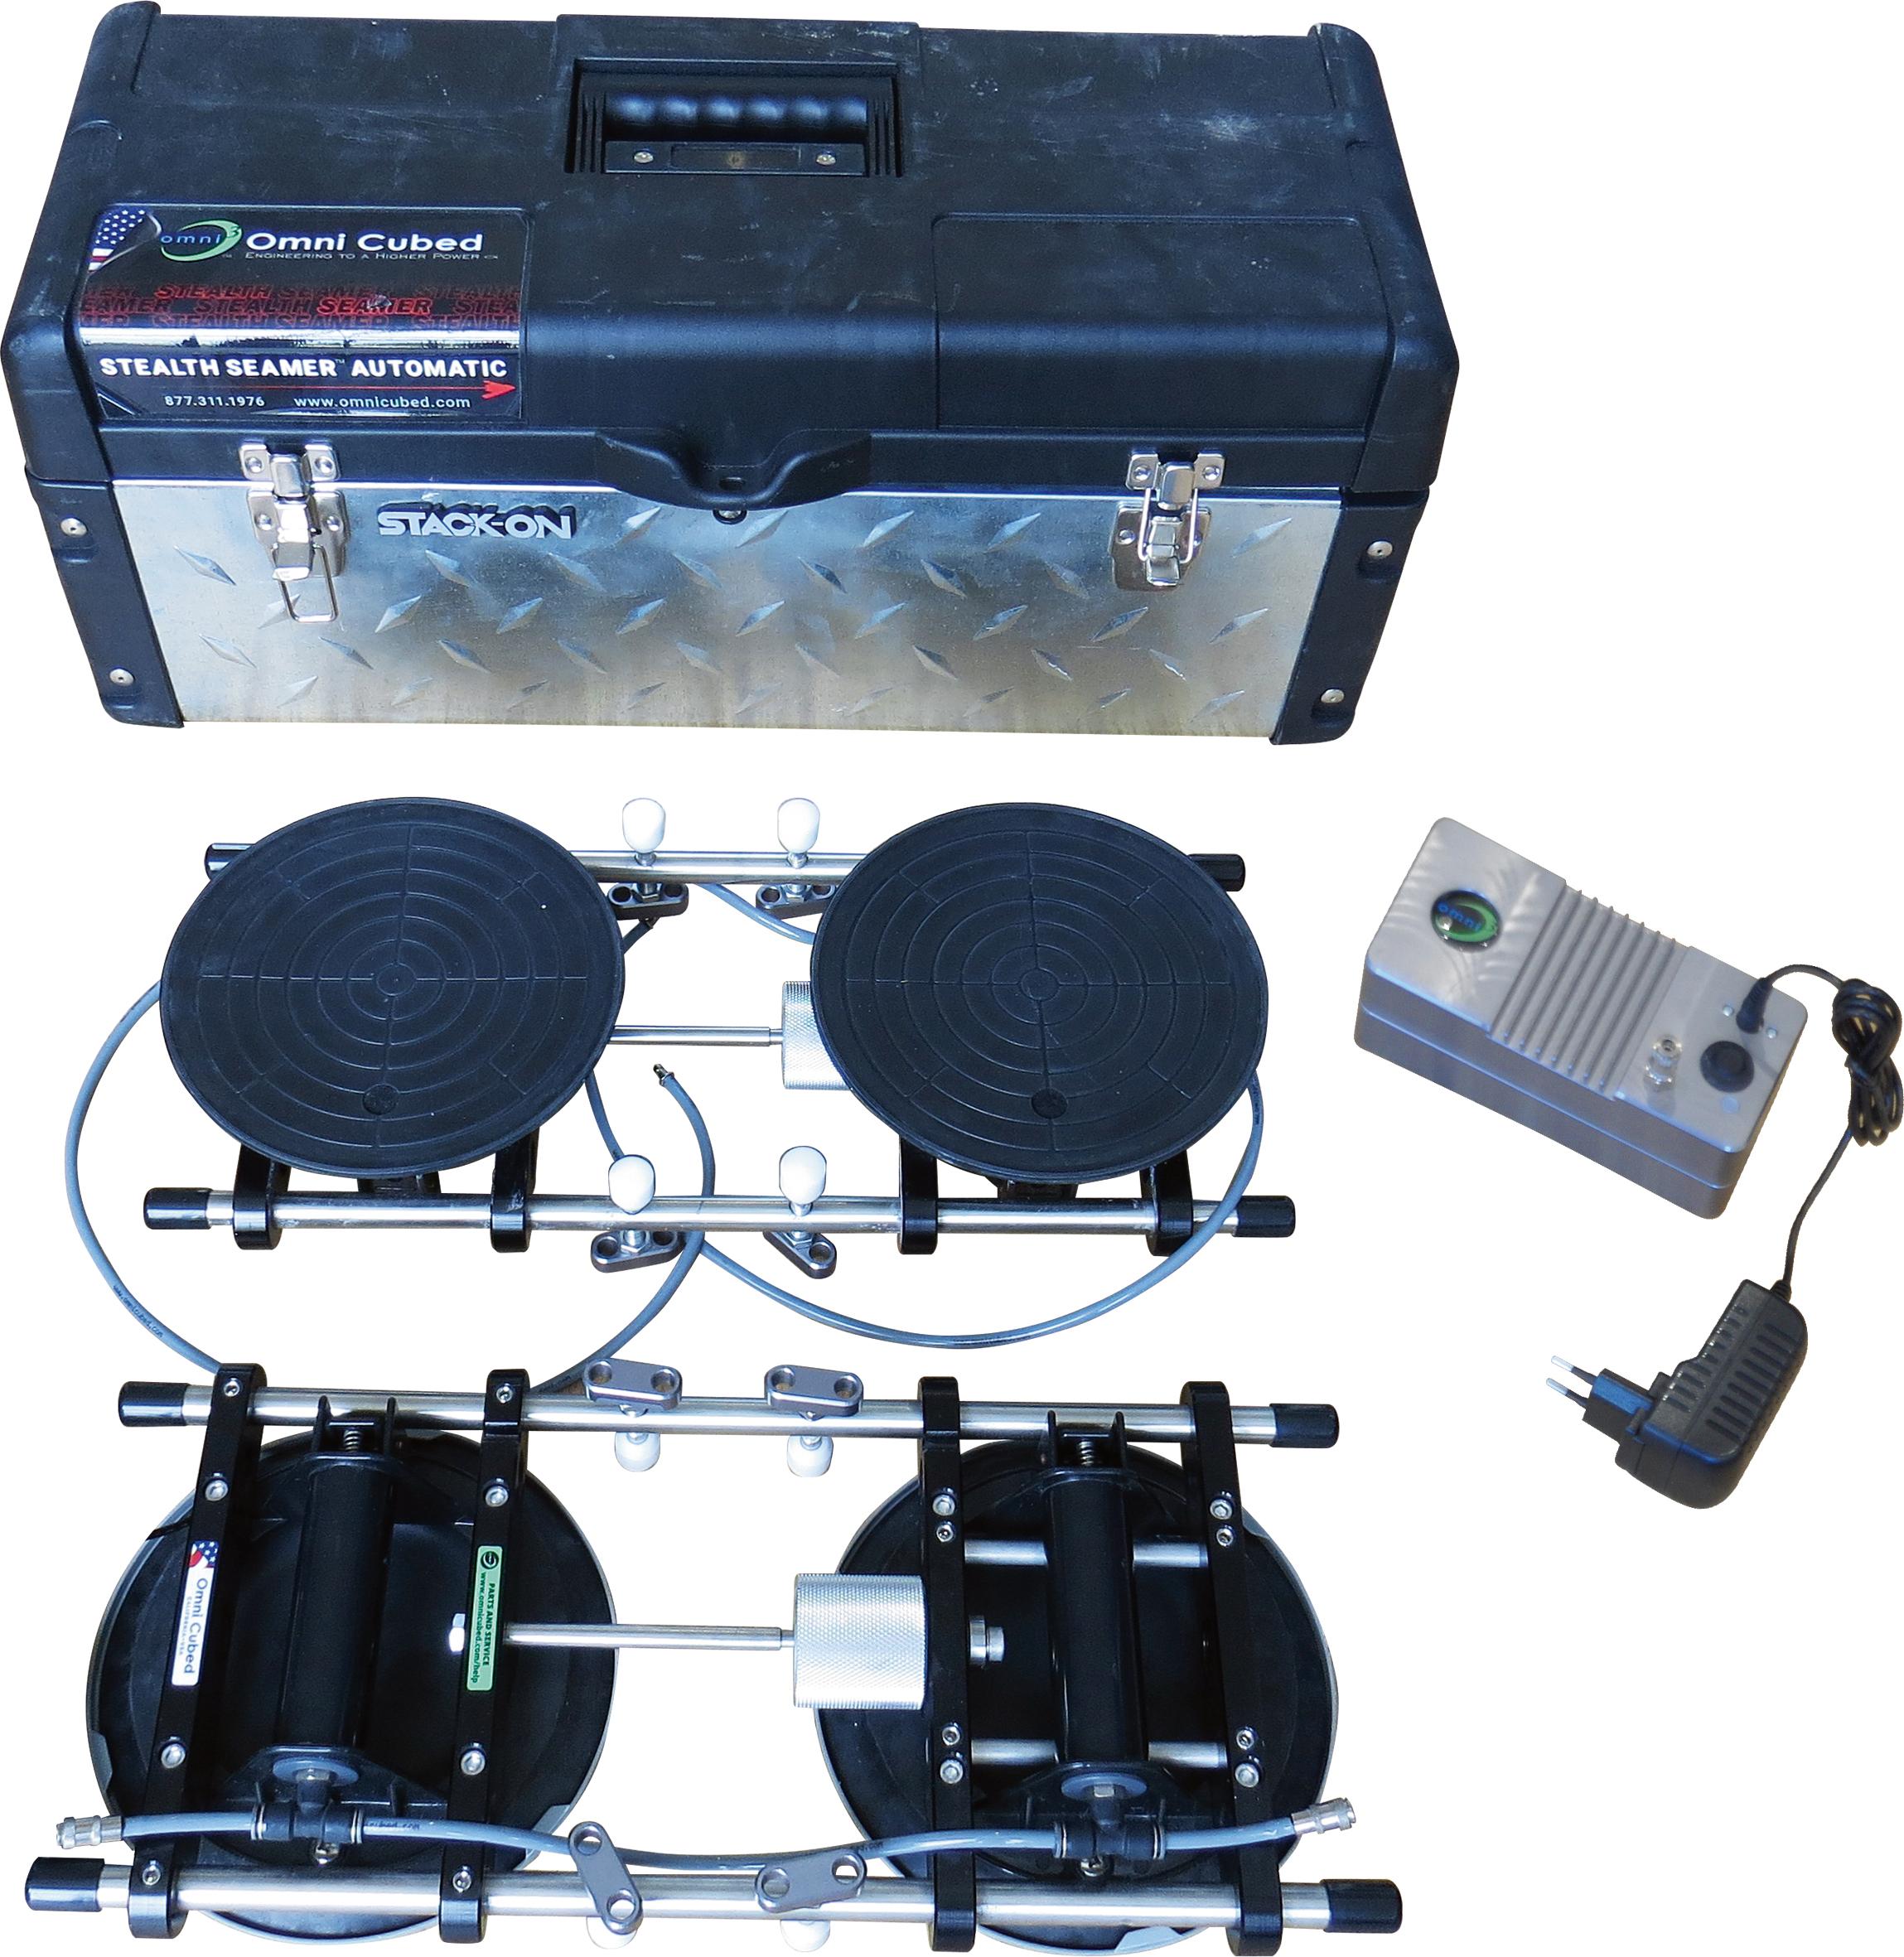 Omni Cubed Pro Stealth Seamer Automatic | 8 Saugplatten ø200mm | Pumpe 230 Volt